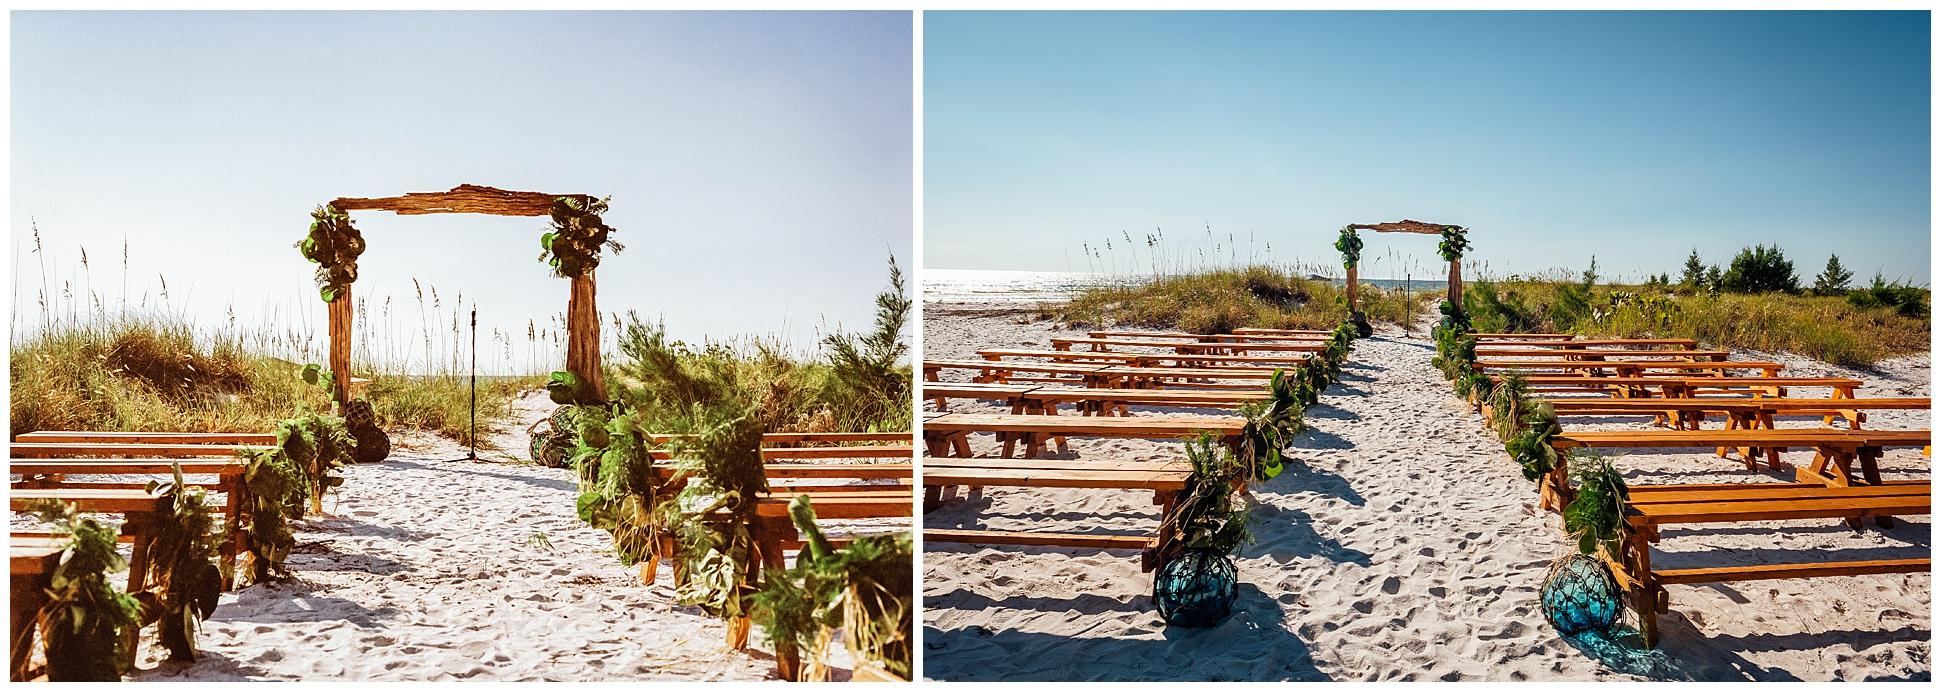 medium-format-film-vs-digital-wedding-photography-florida-beach_0006.jpg